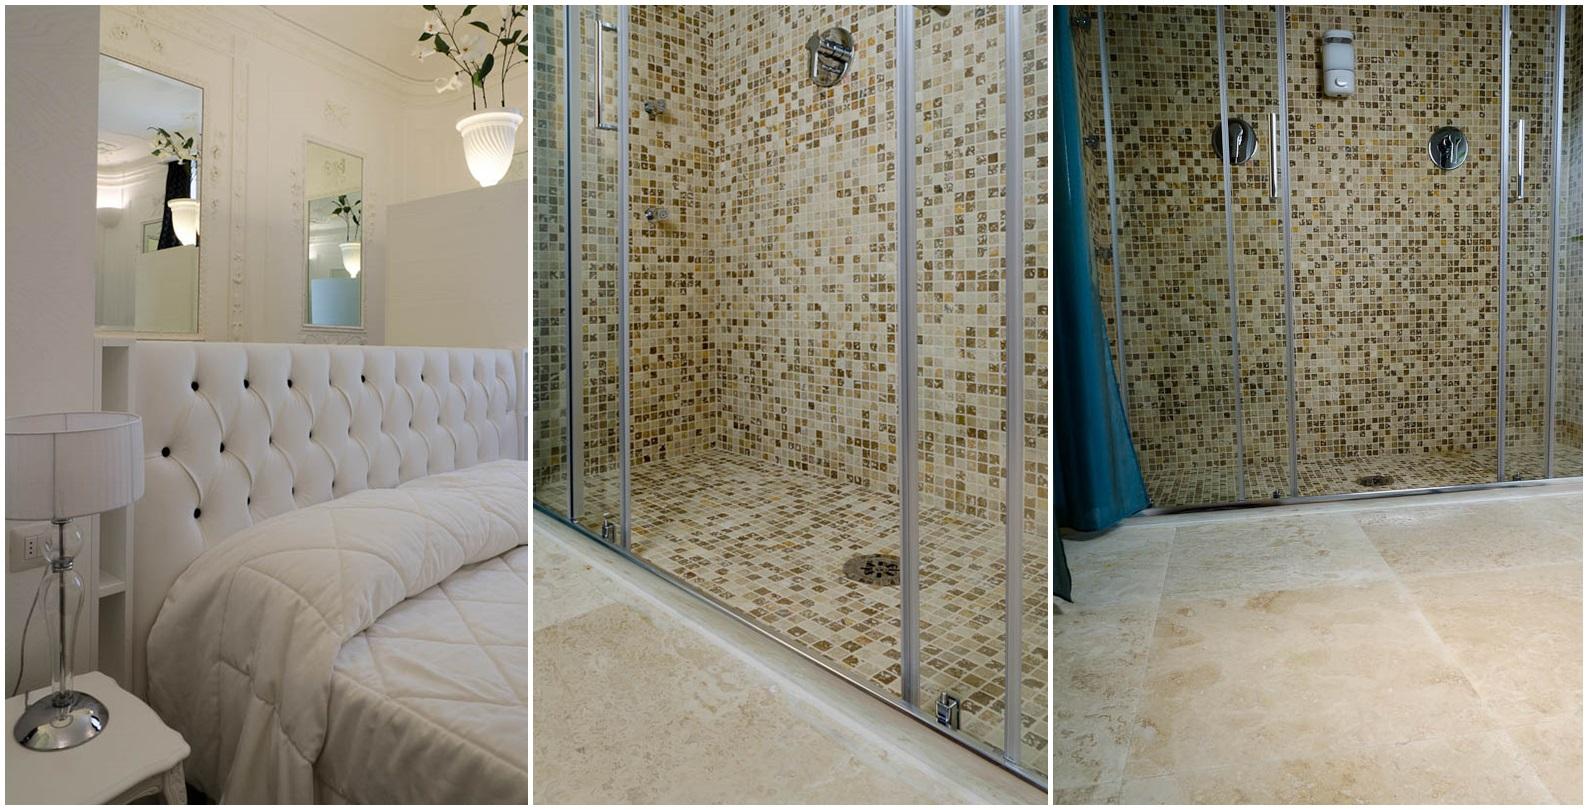 Clikad comodini design - Bagno rivestimento pietra ...